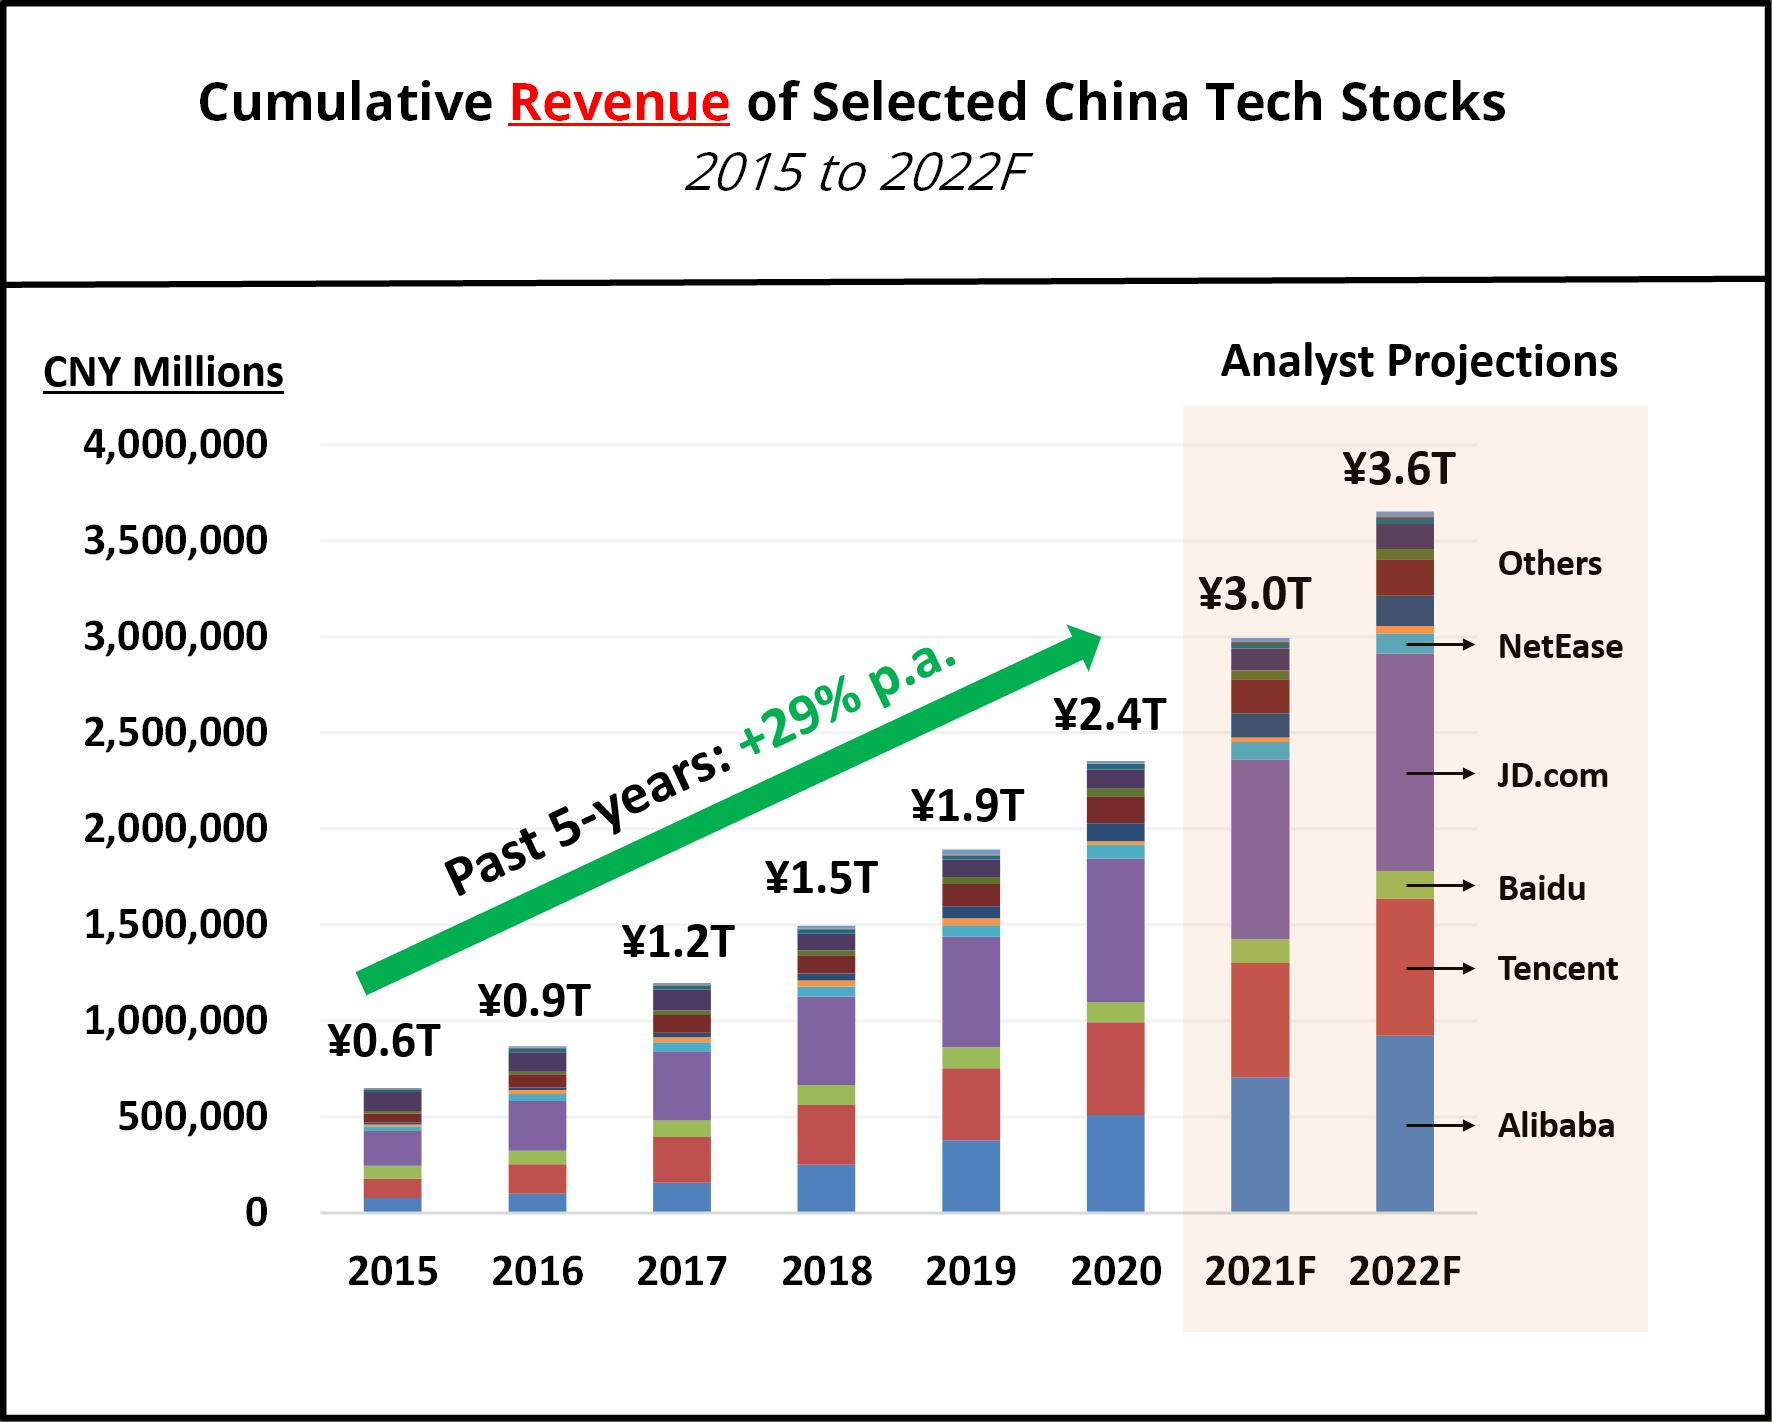 srcset=https://i2.wp.com/theinvestquest.com/wp-content/uploads/Cumulative-revenue-China-tech-stocks.png?w=1772&ssl=1